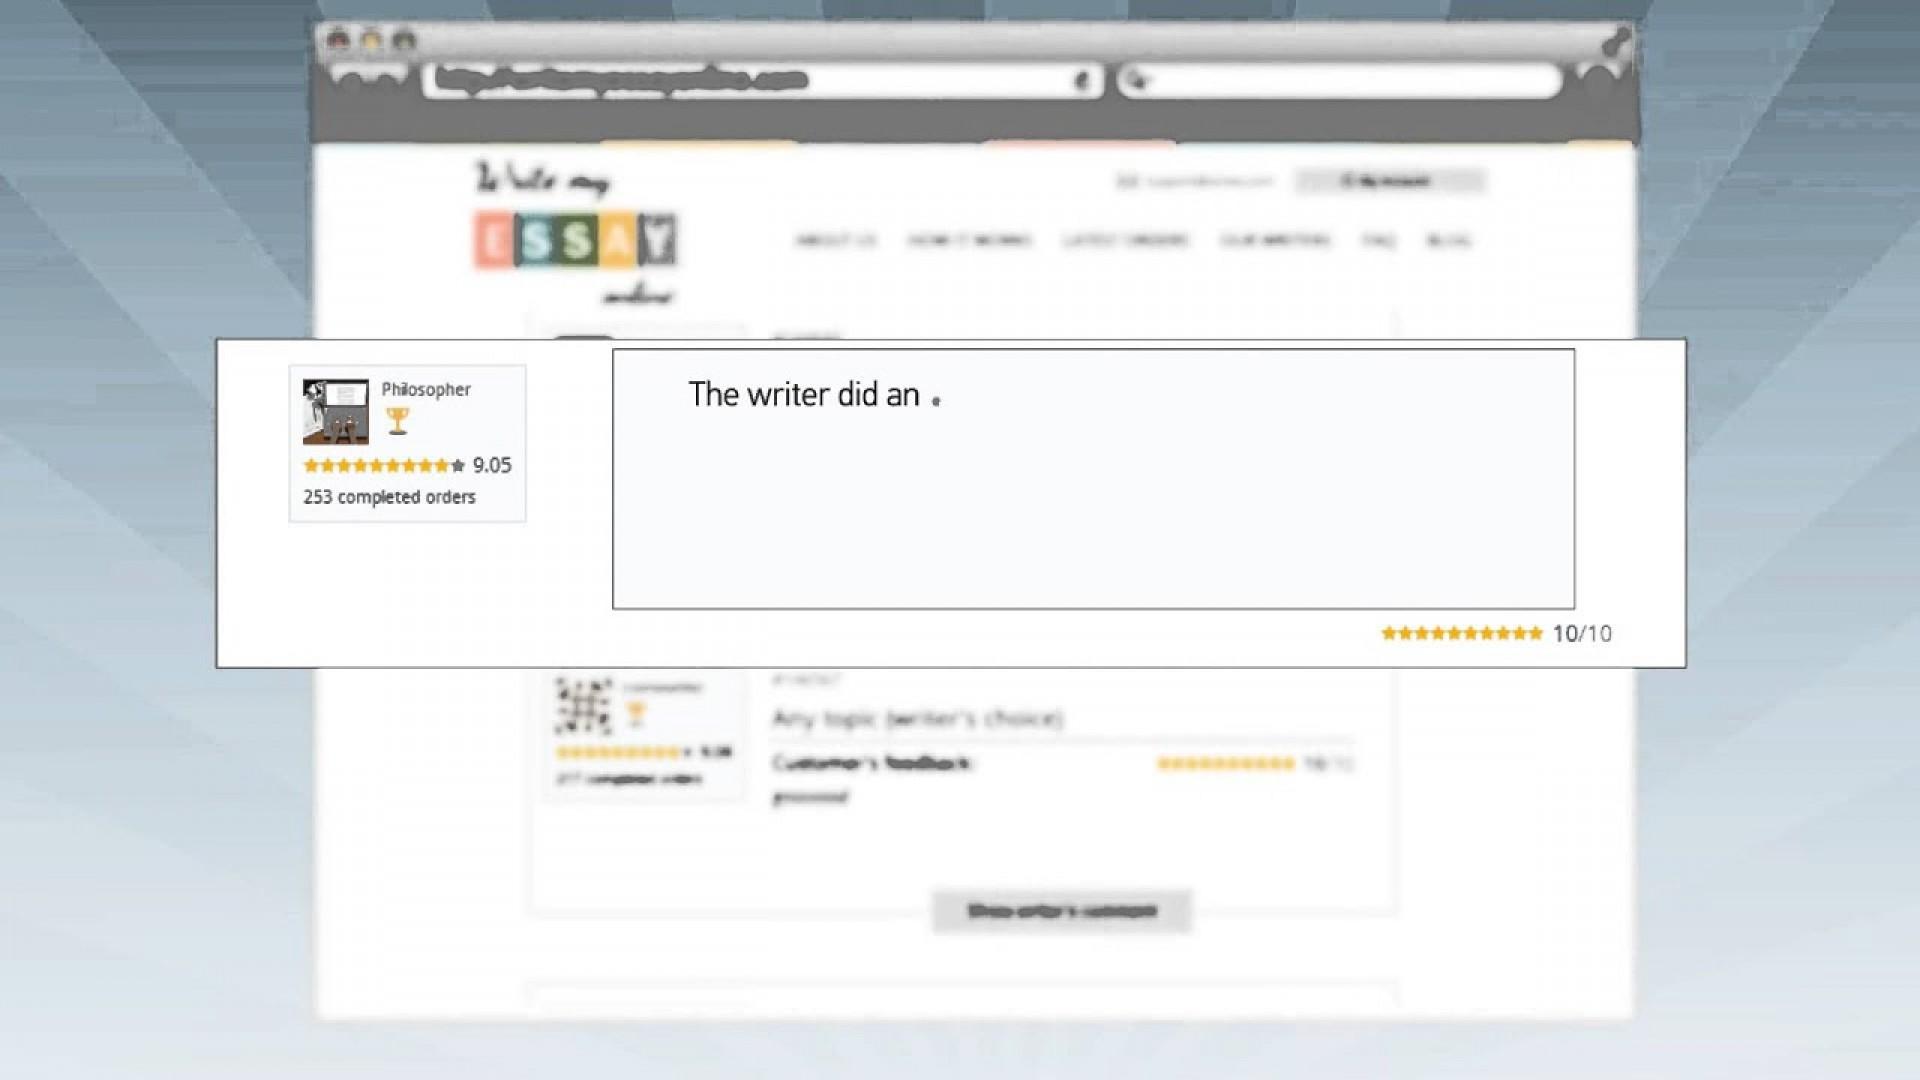 012 Essay Example Write My For Free Shocking App Argumentative Online 1920